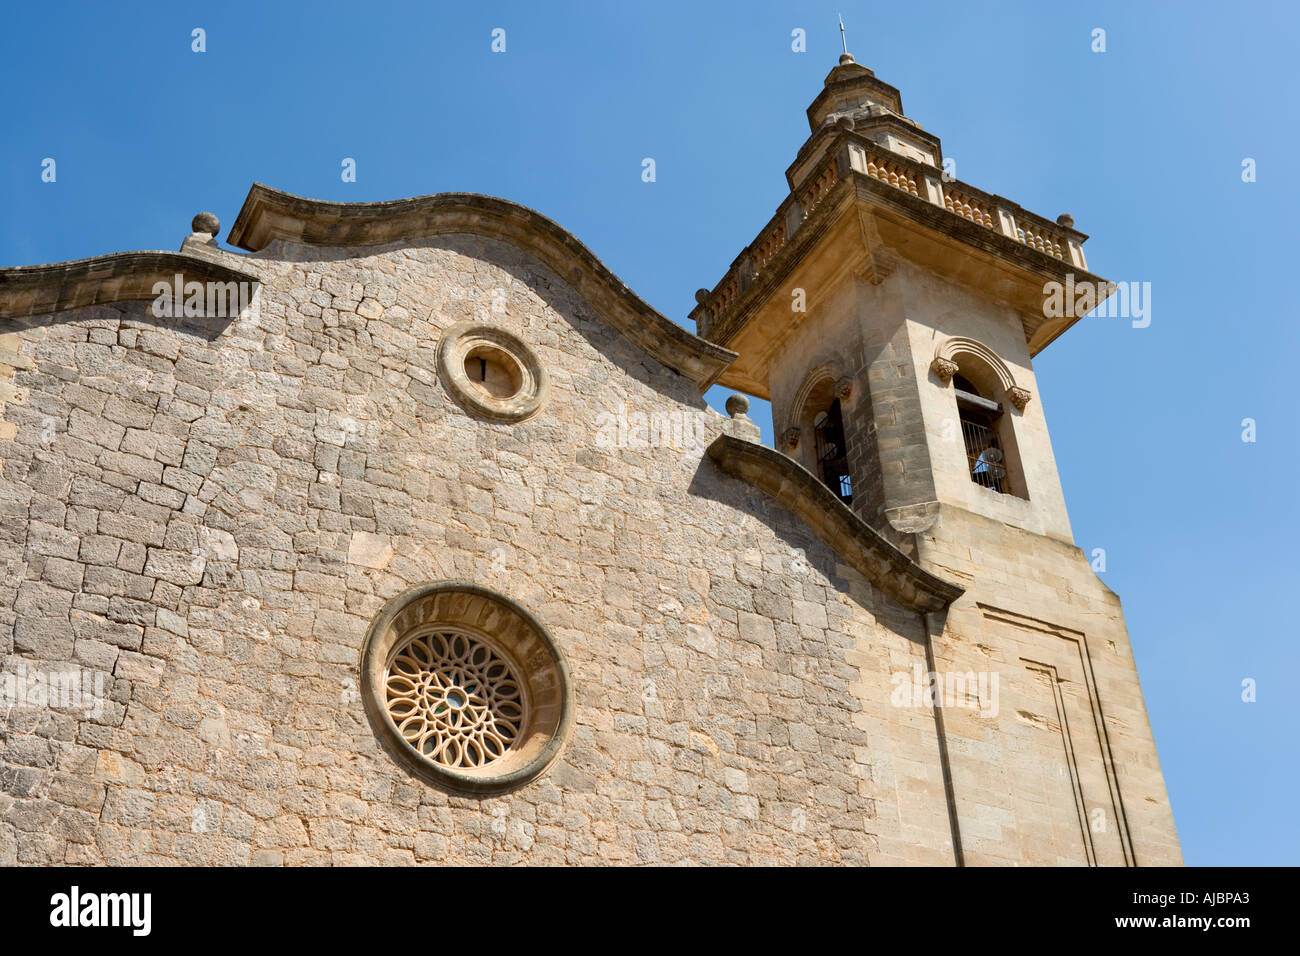 Parish Church of San Bartolome, Old Town of Valldemossa, West Coast, Mallorca, Spain Stock Photo